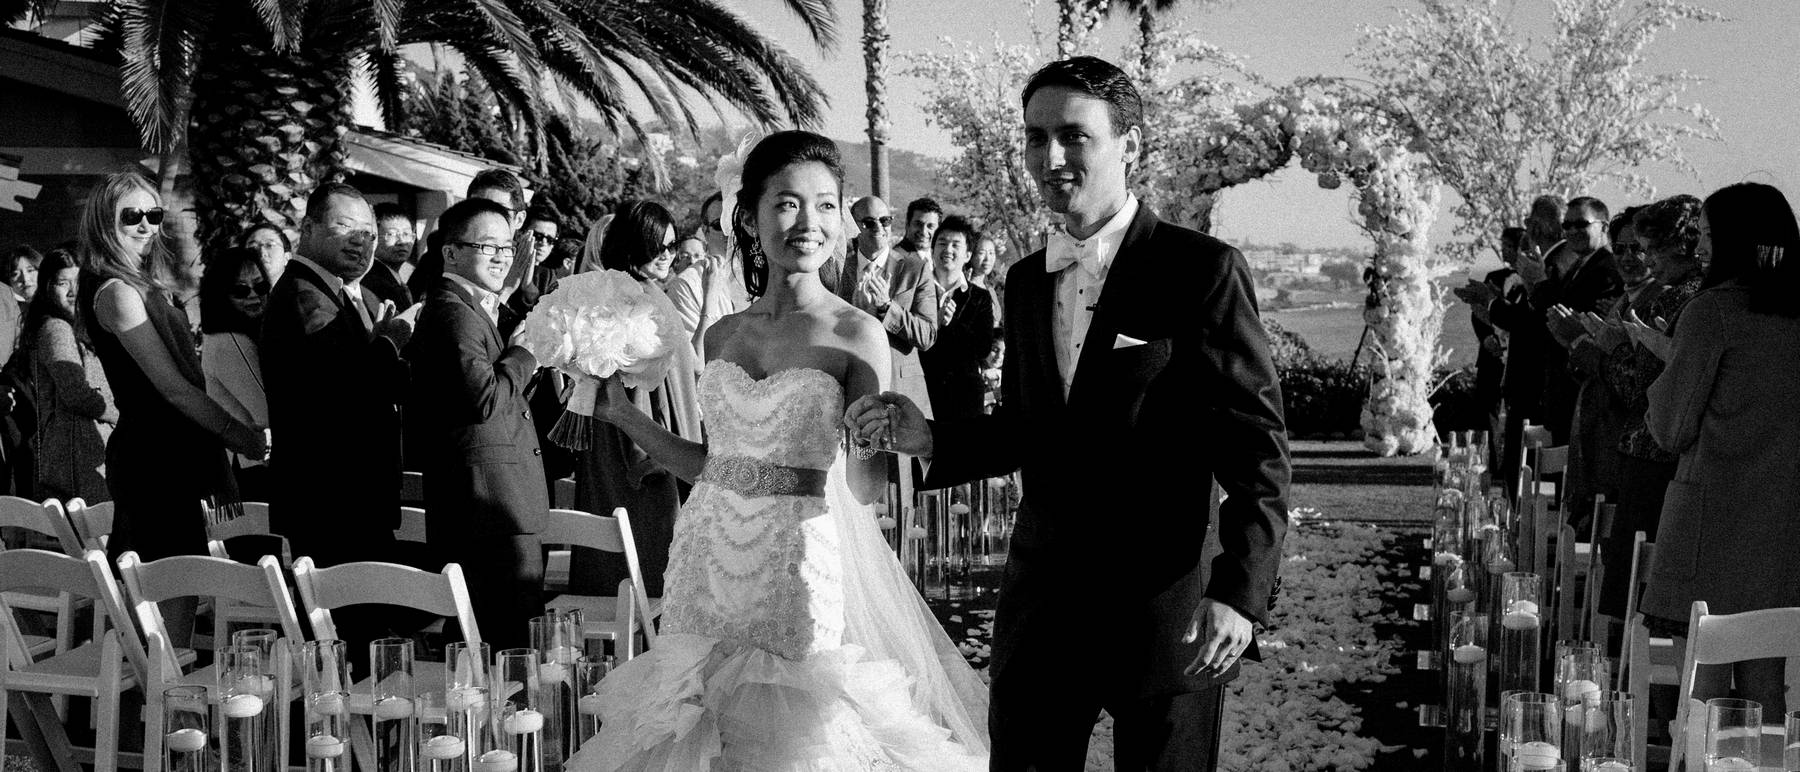 johnandjoseph-wedding-photographer-hz-slider-325